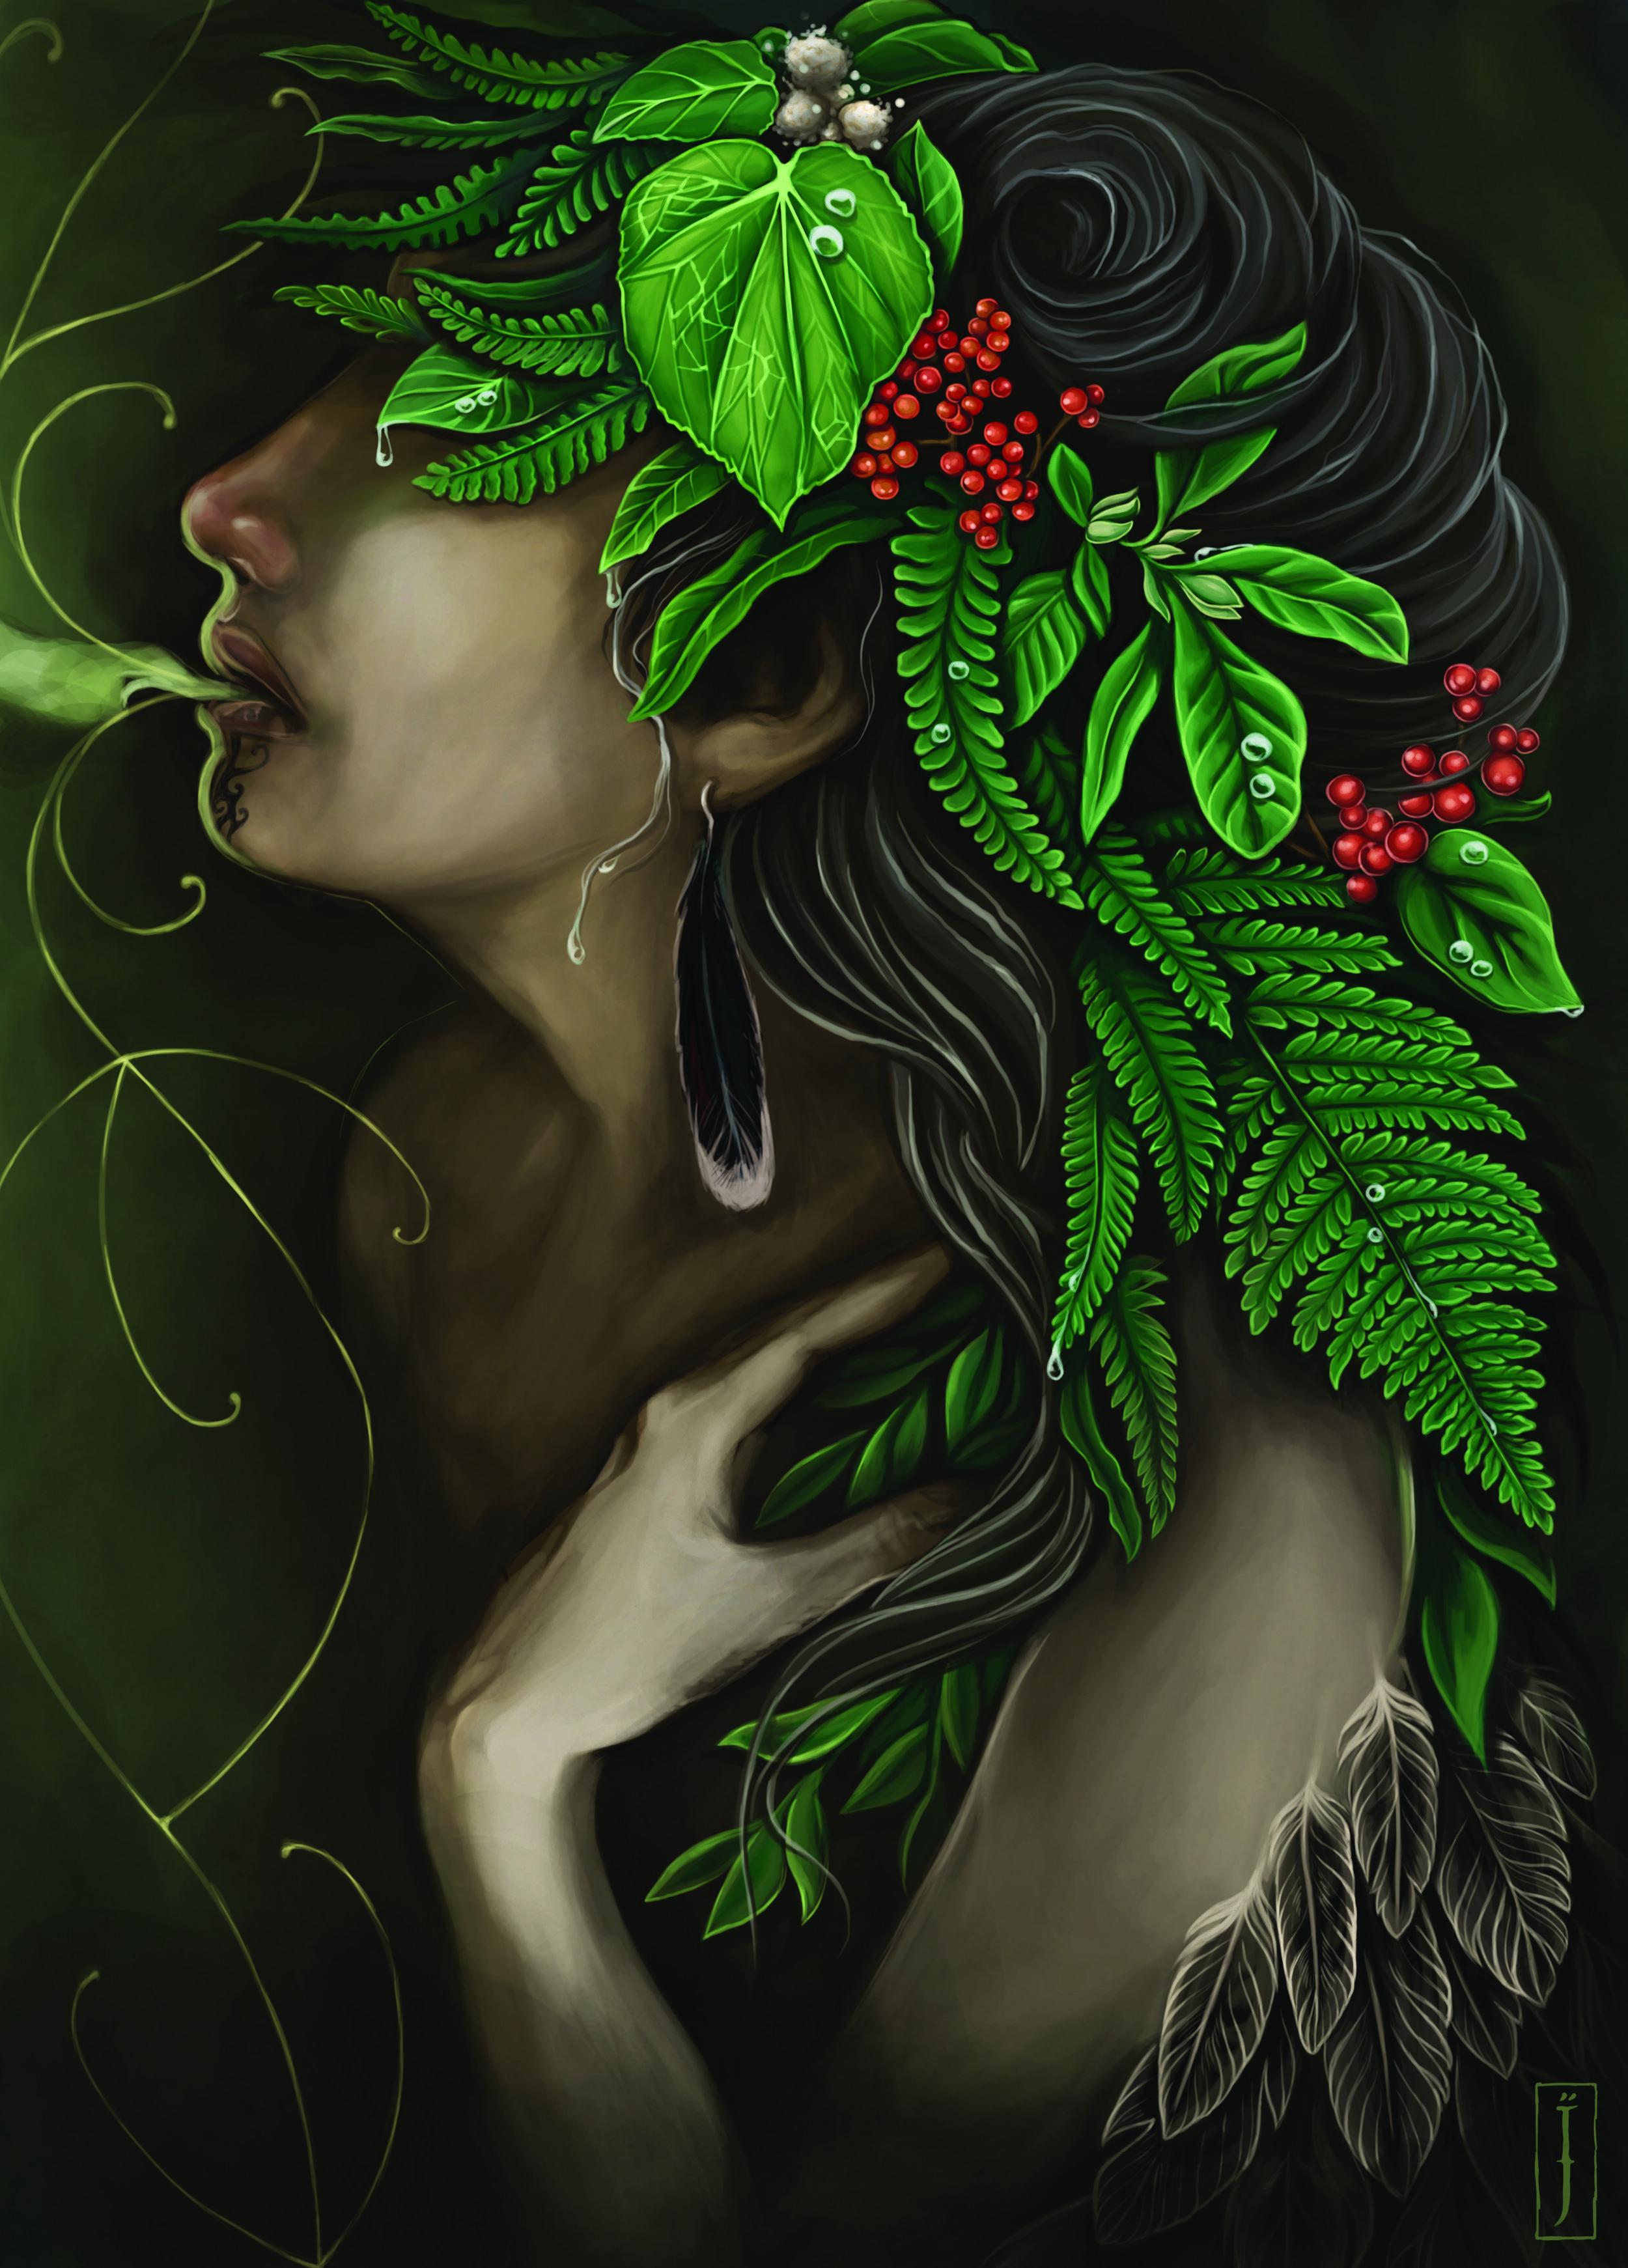 'Whakangā, we are one with the earth' by Isobel Joy Te Aho-White